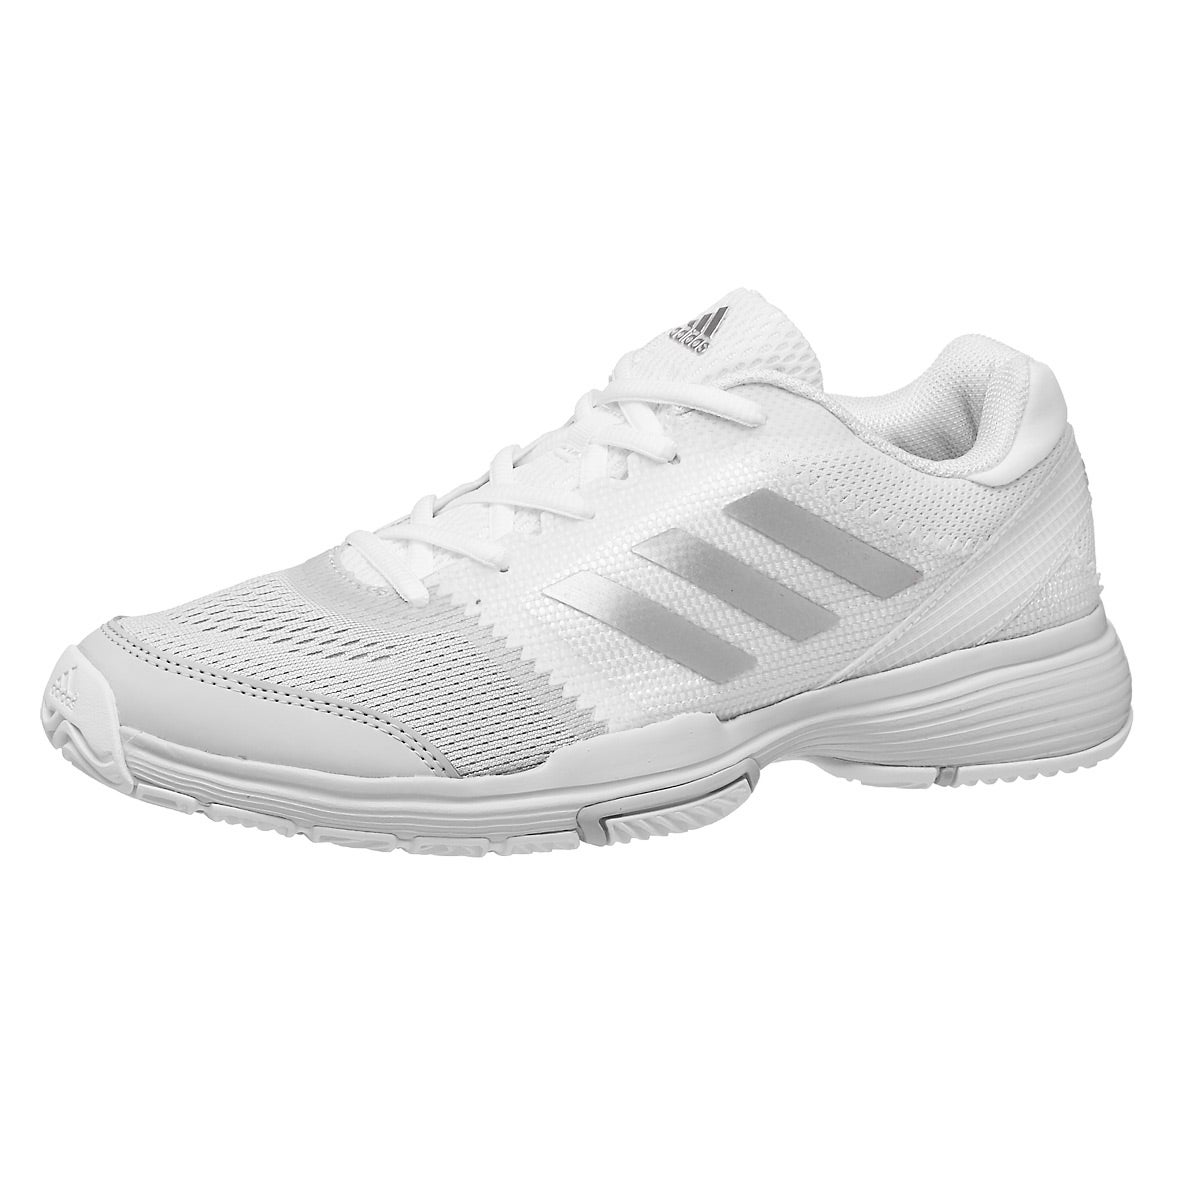 adidas barrikade club weiß / grau / silber damenschuhe 360 ° blick